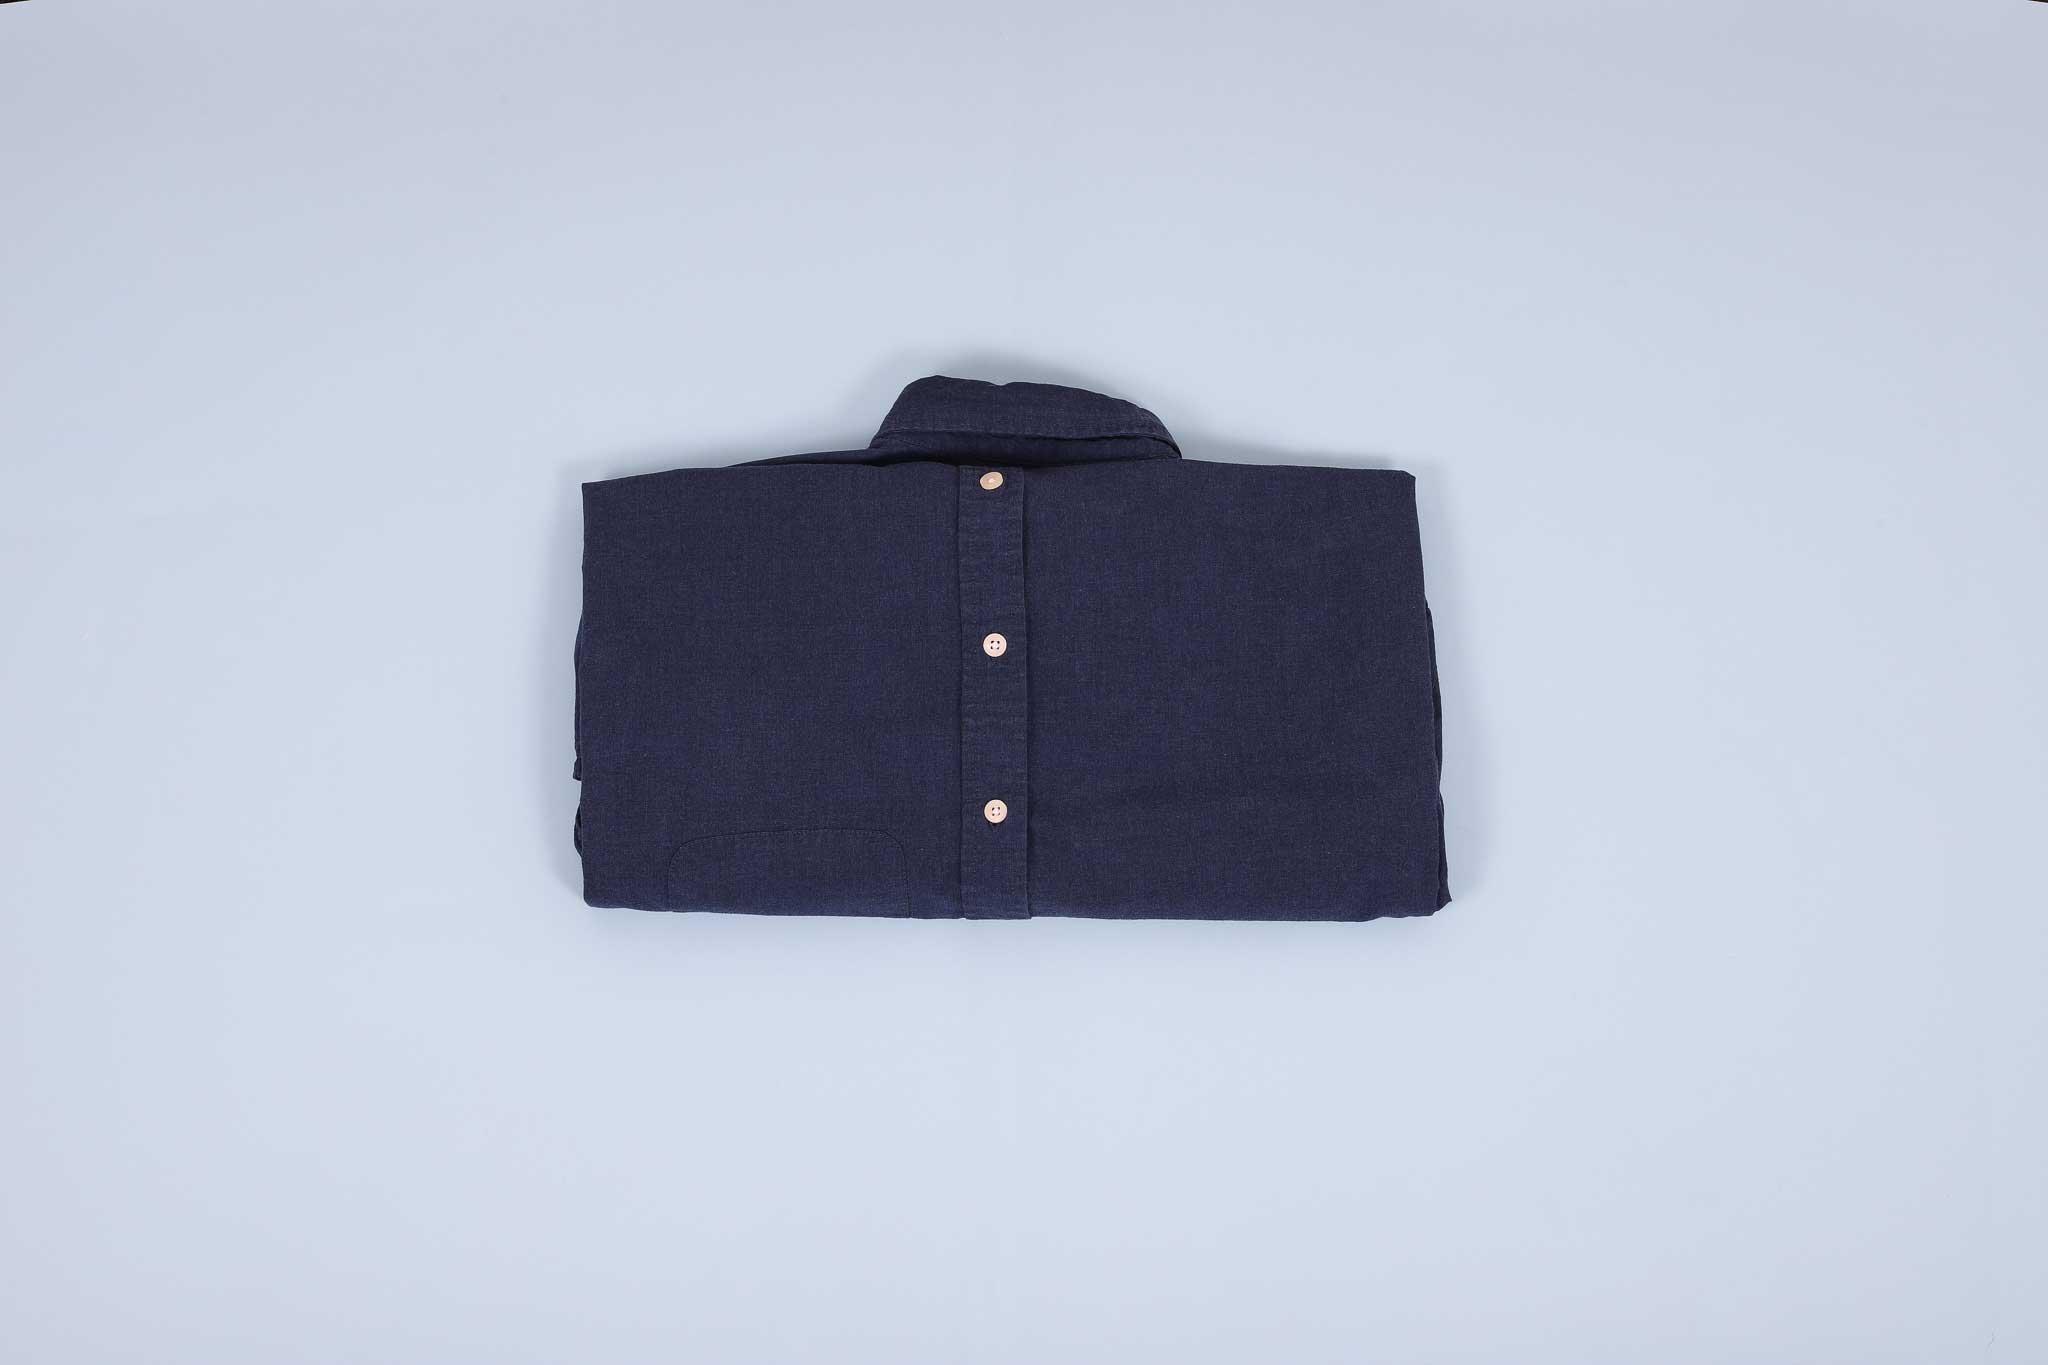 Navy dress shirt folded into thirds facing down